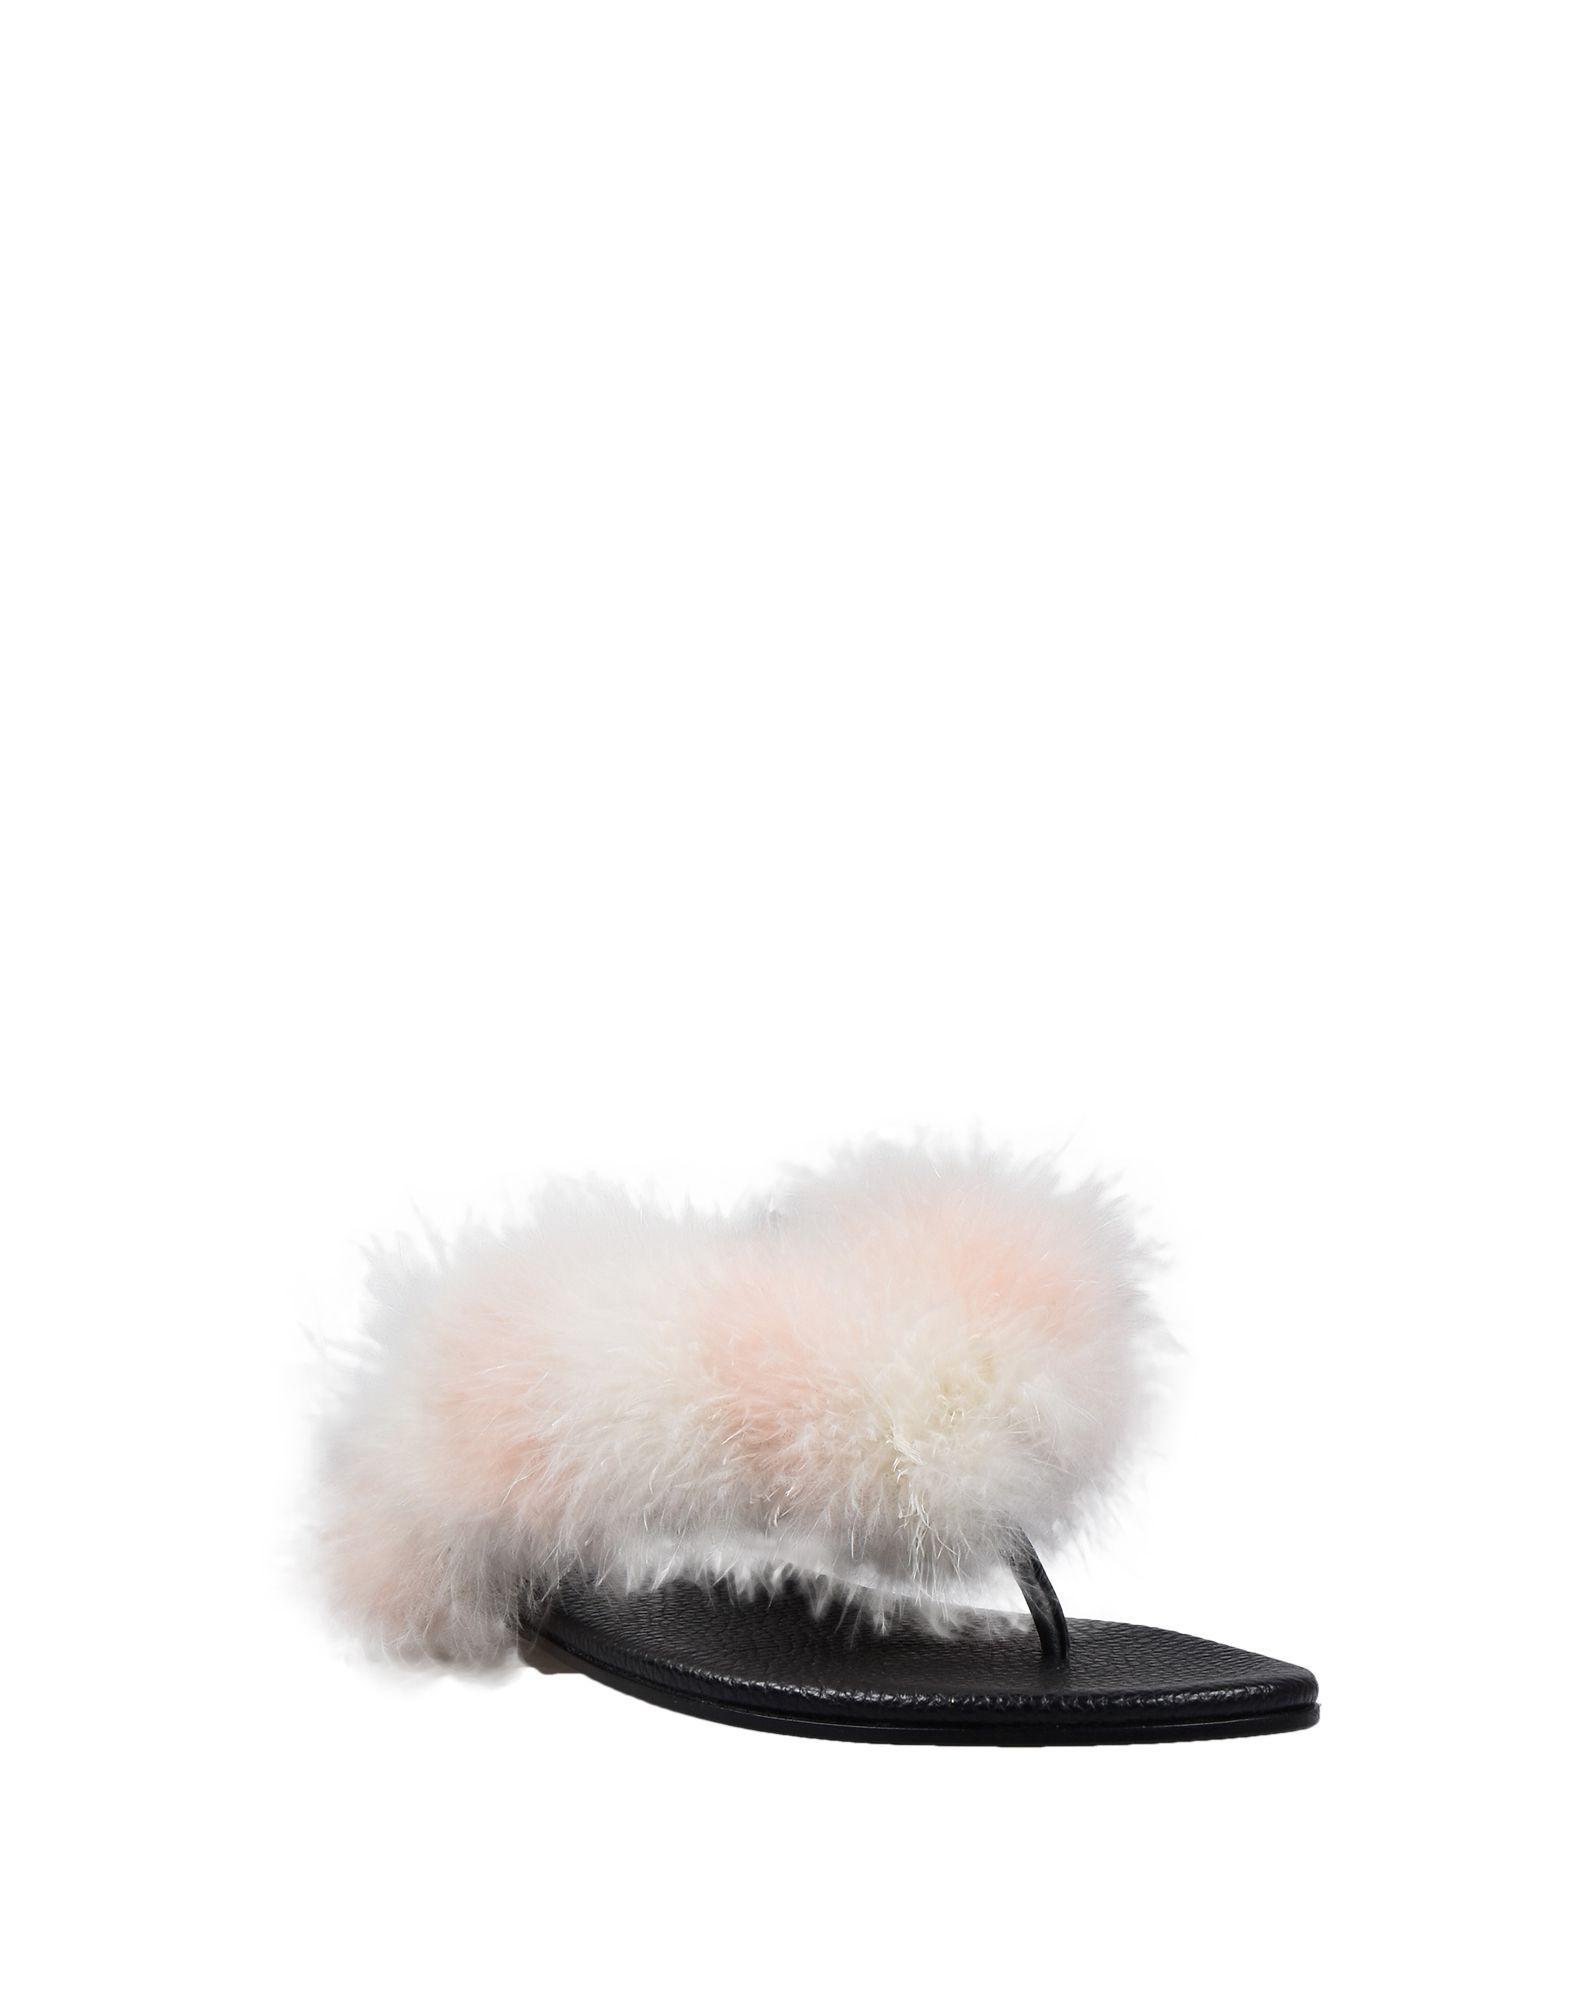 Avec Moderation Ivory Marabou Sandals